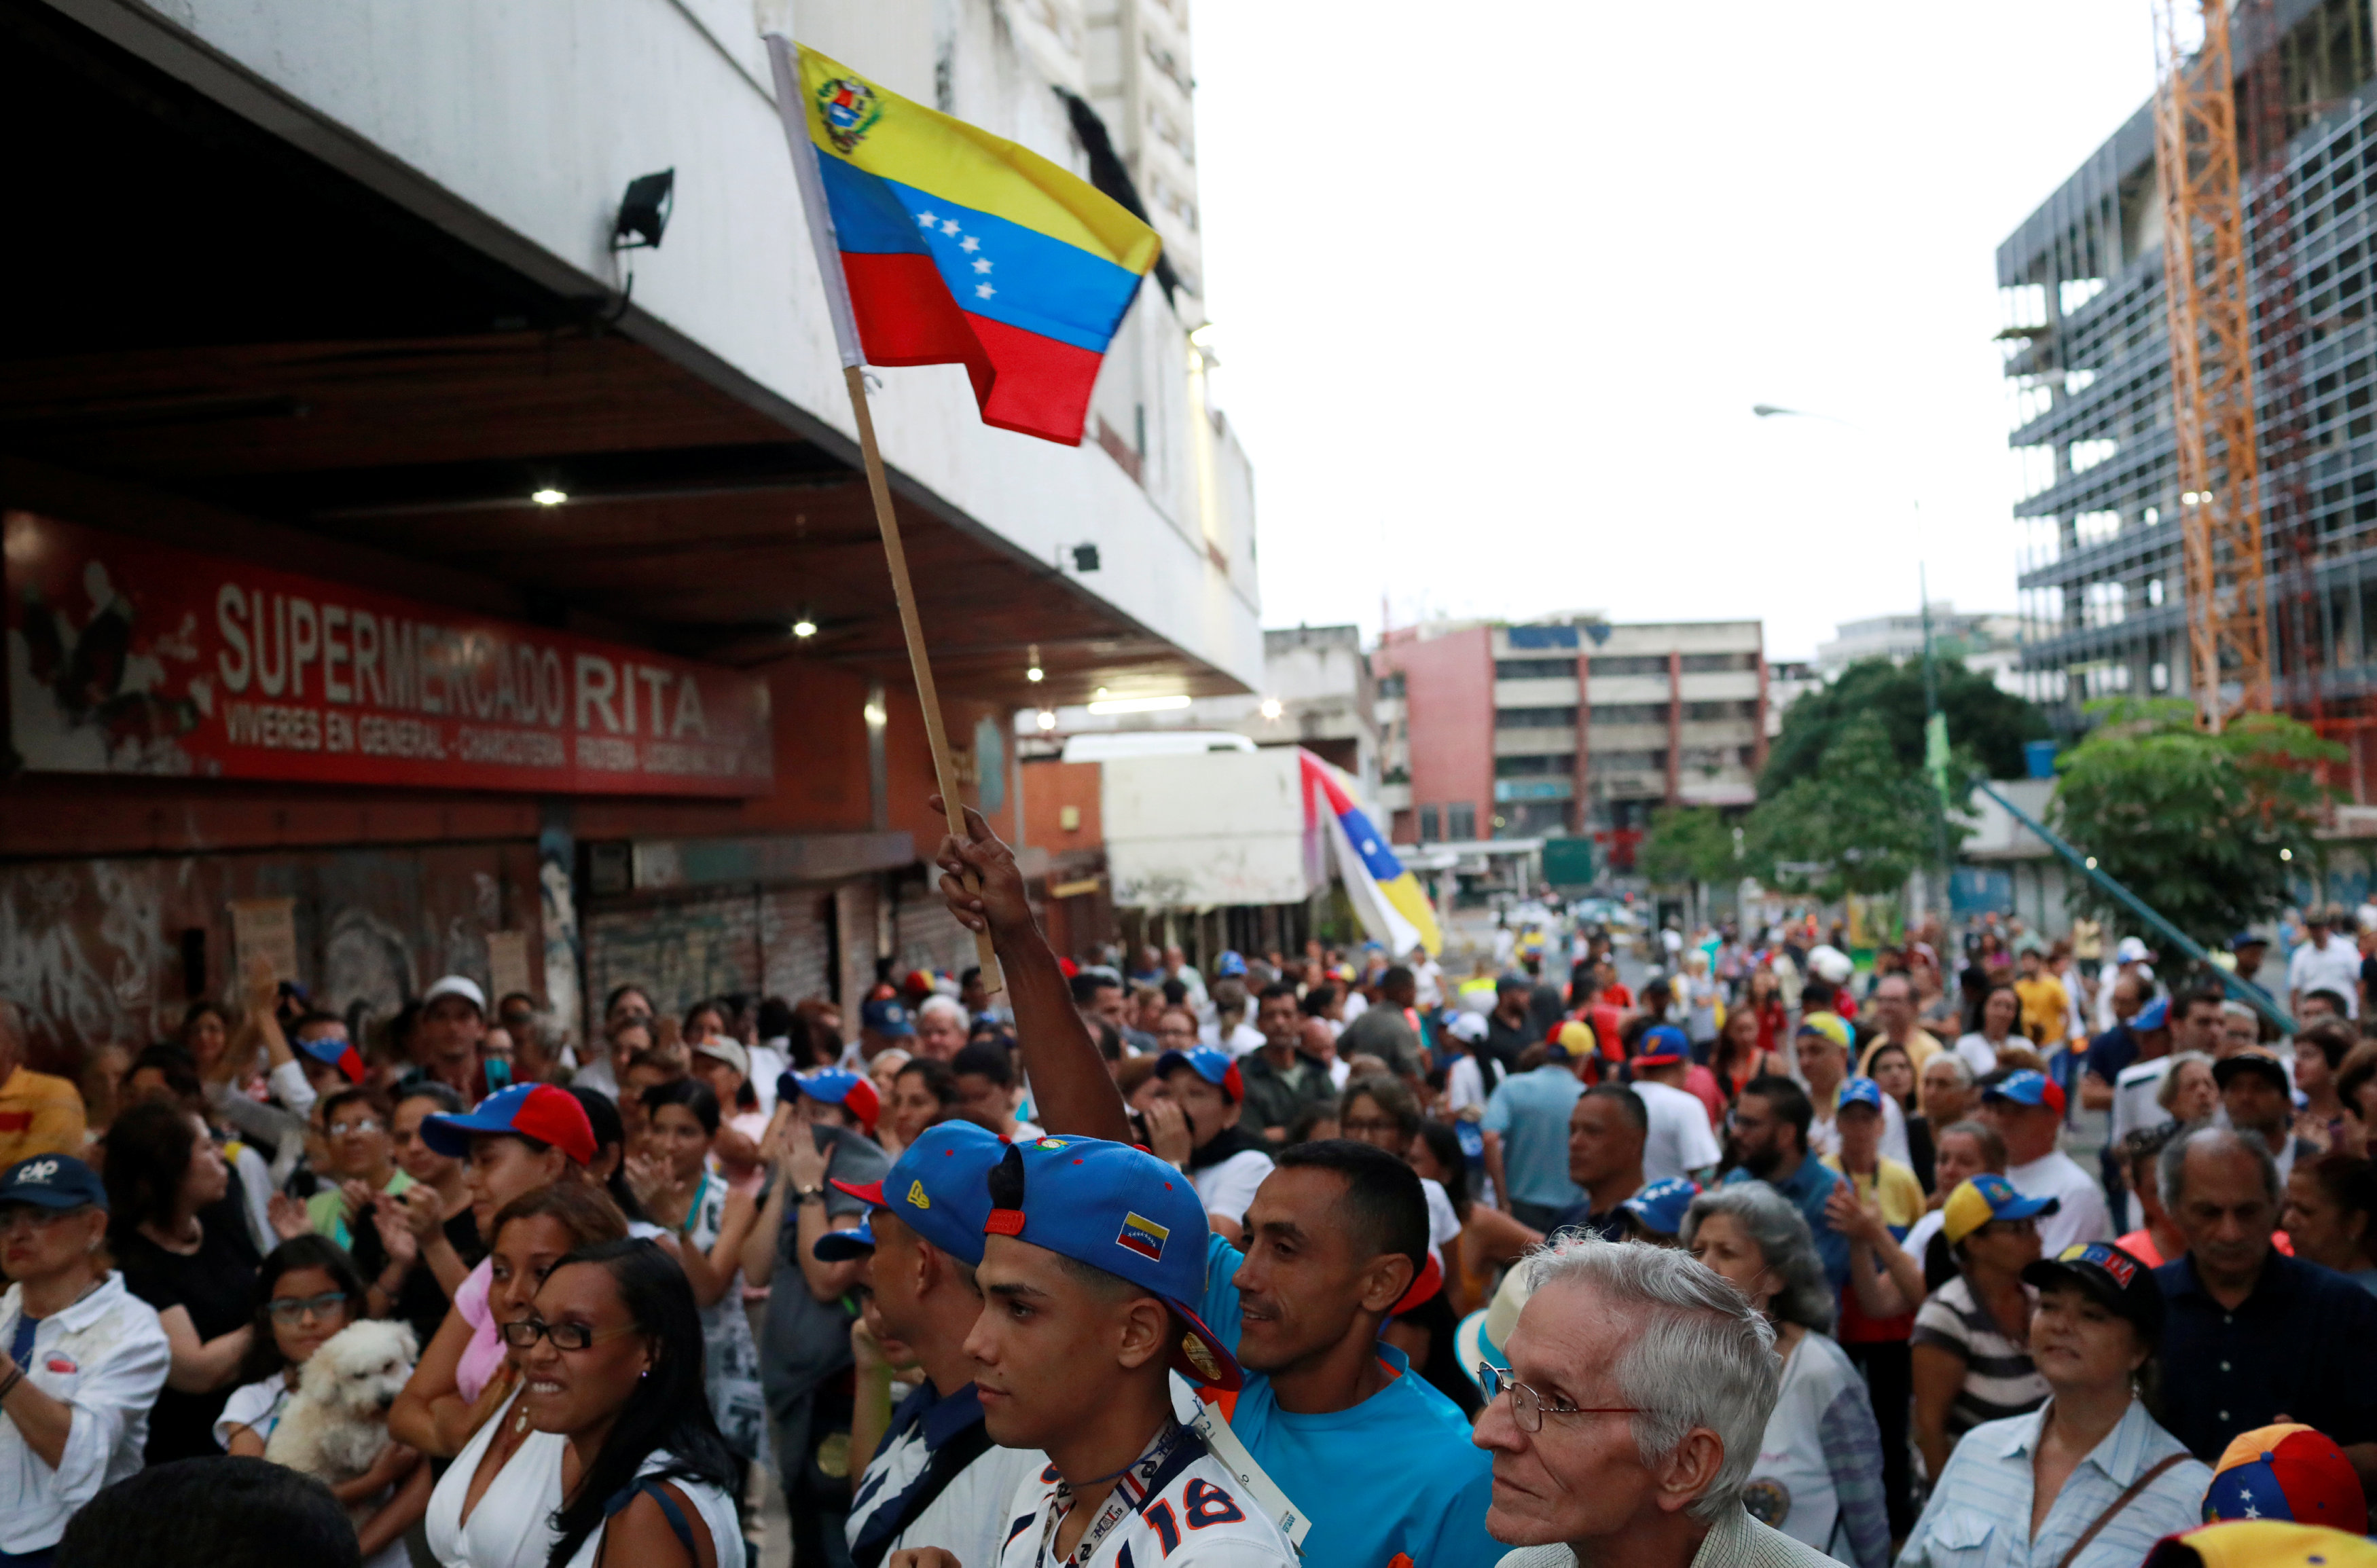 2017 07 16T232258Z 2060900411 RC1D449F69E0 RTRMADP 3 VENEZUELA POLITICS